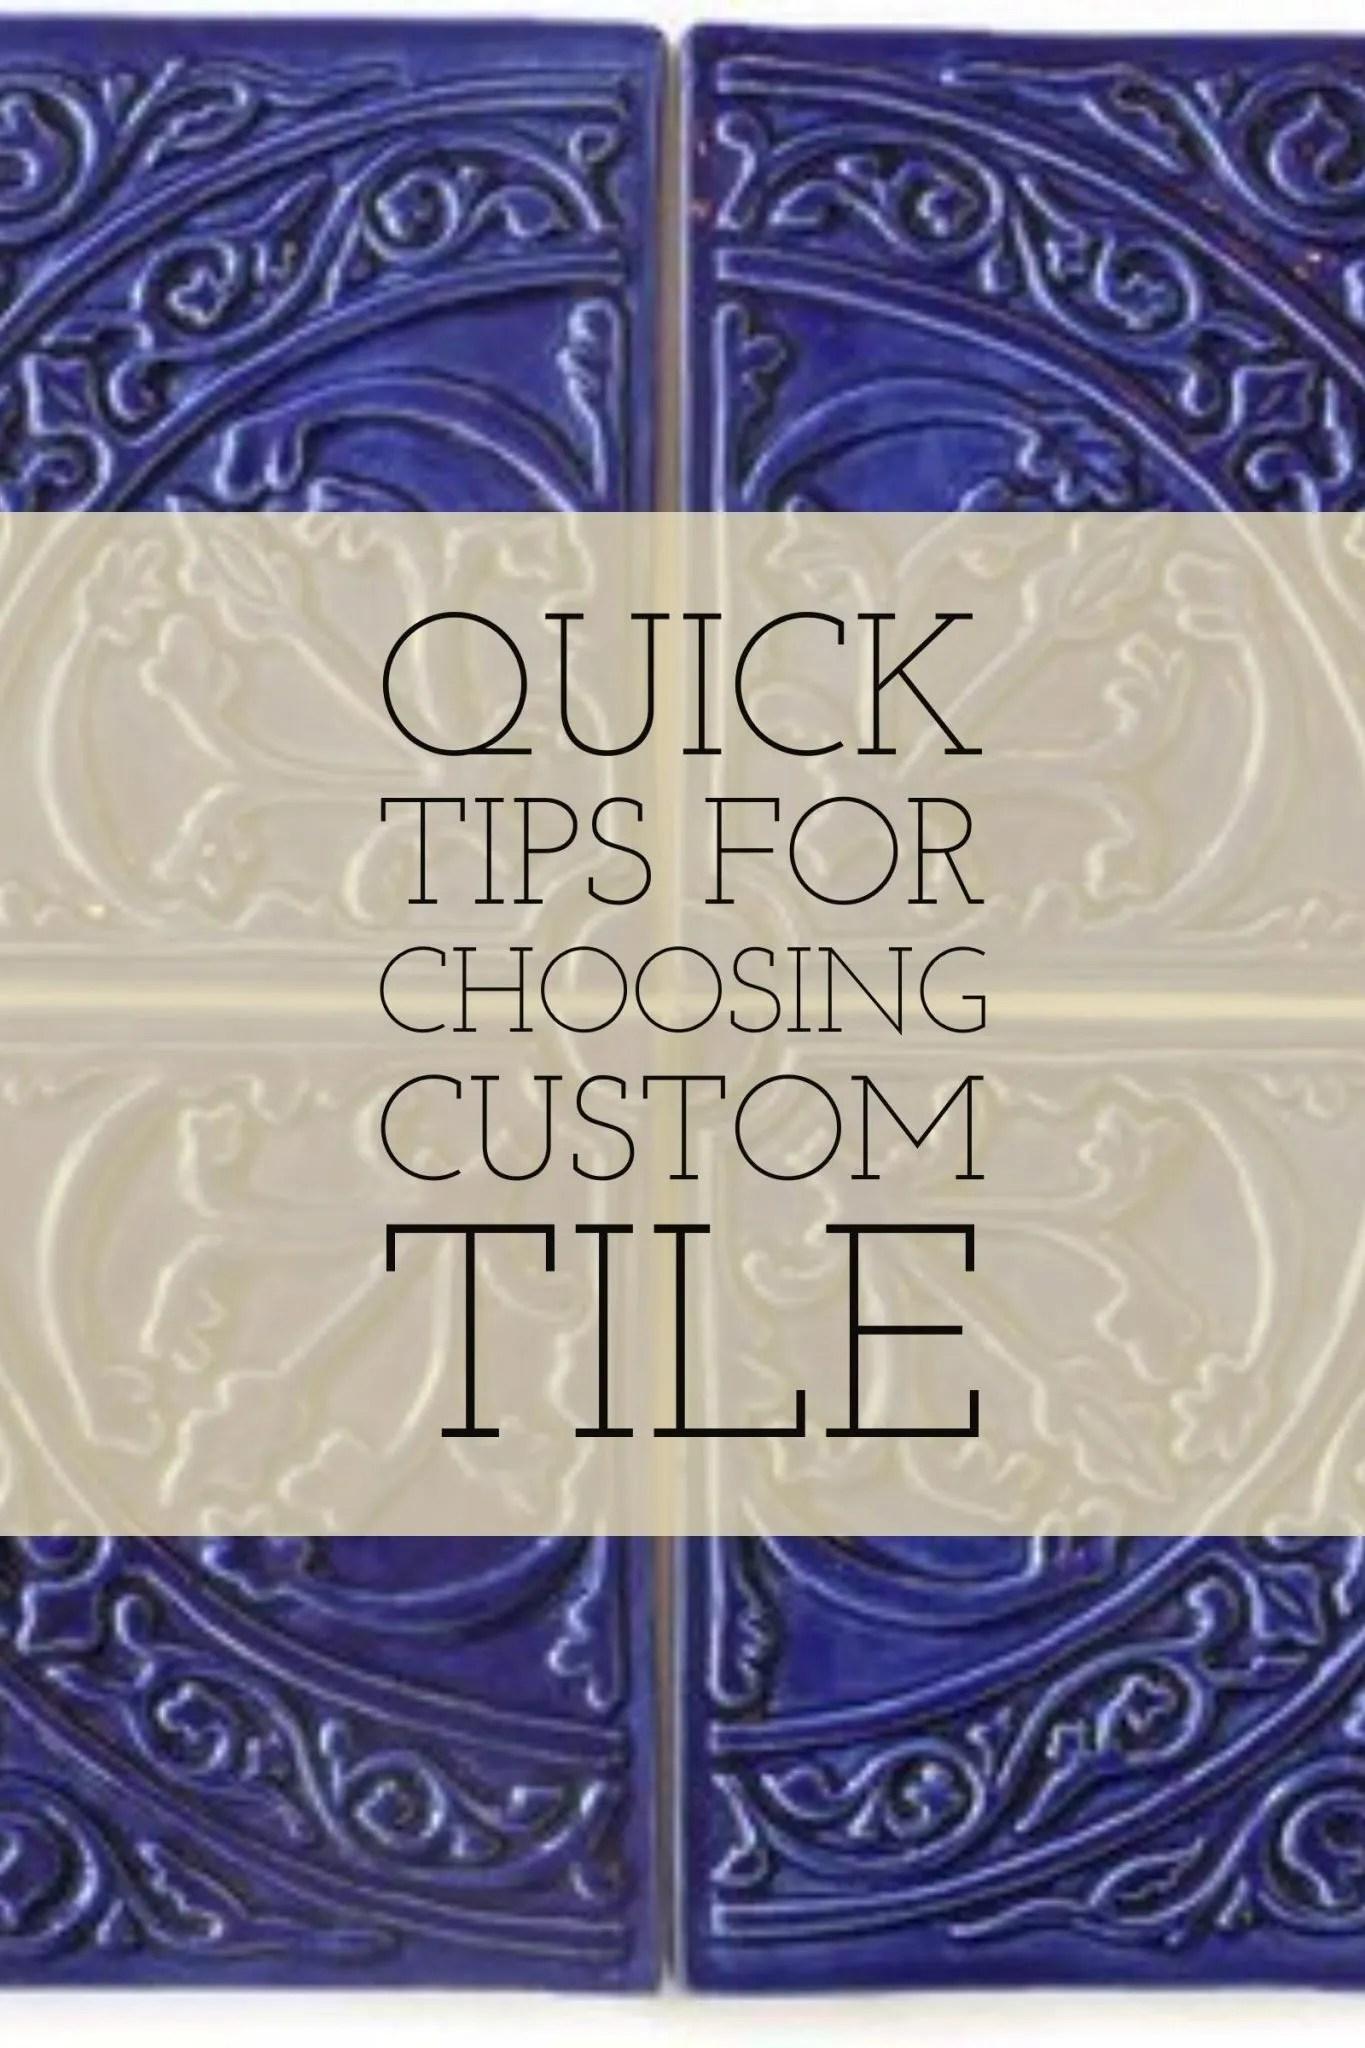 Tips for Choosing Custom, Handcrafted Tile